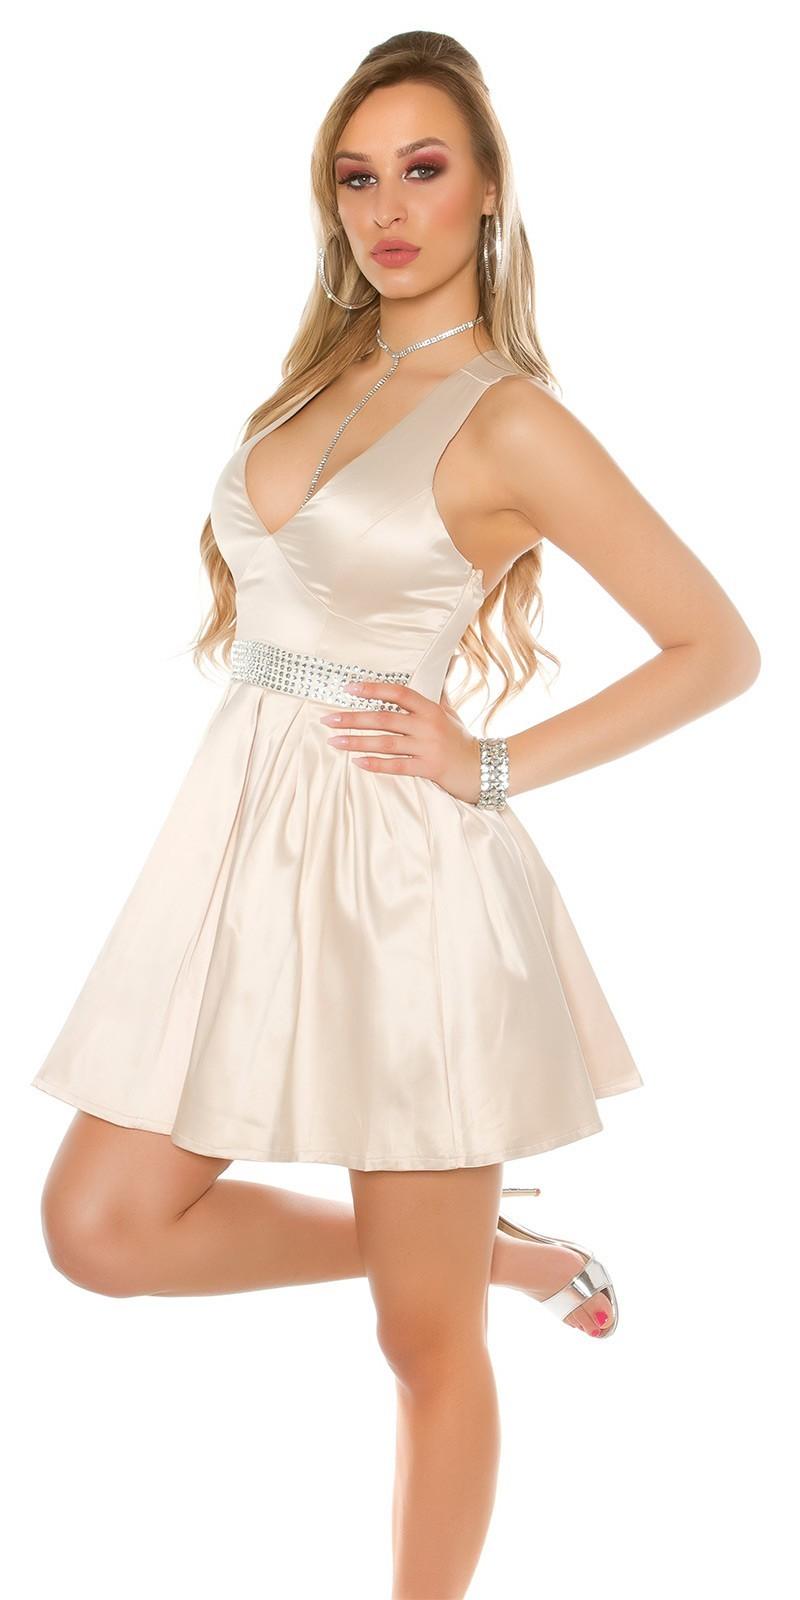 ee6a35ede68f Saténové šaty Beige – Sissy Boutique